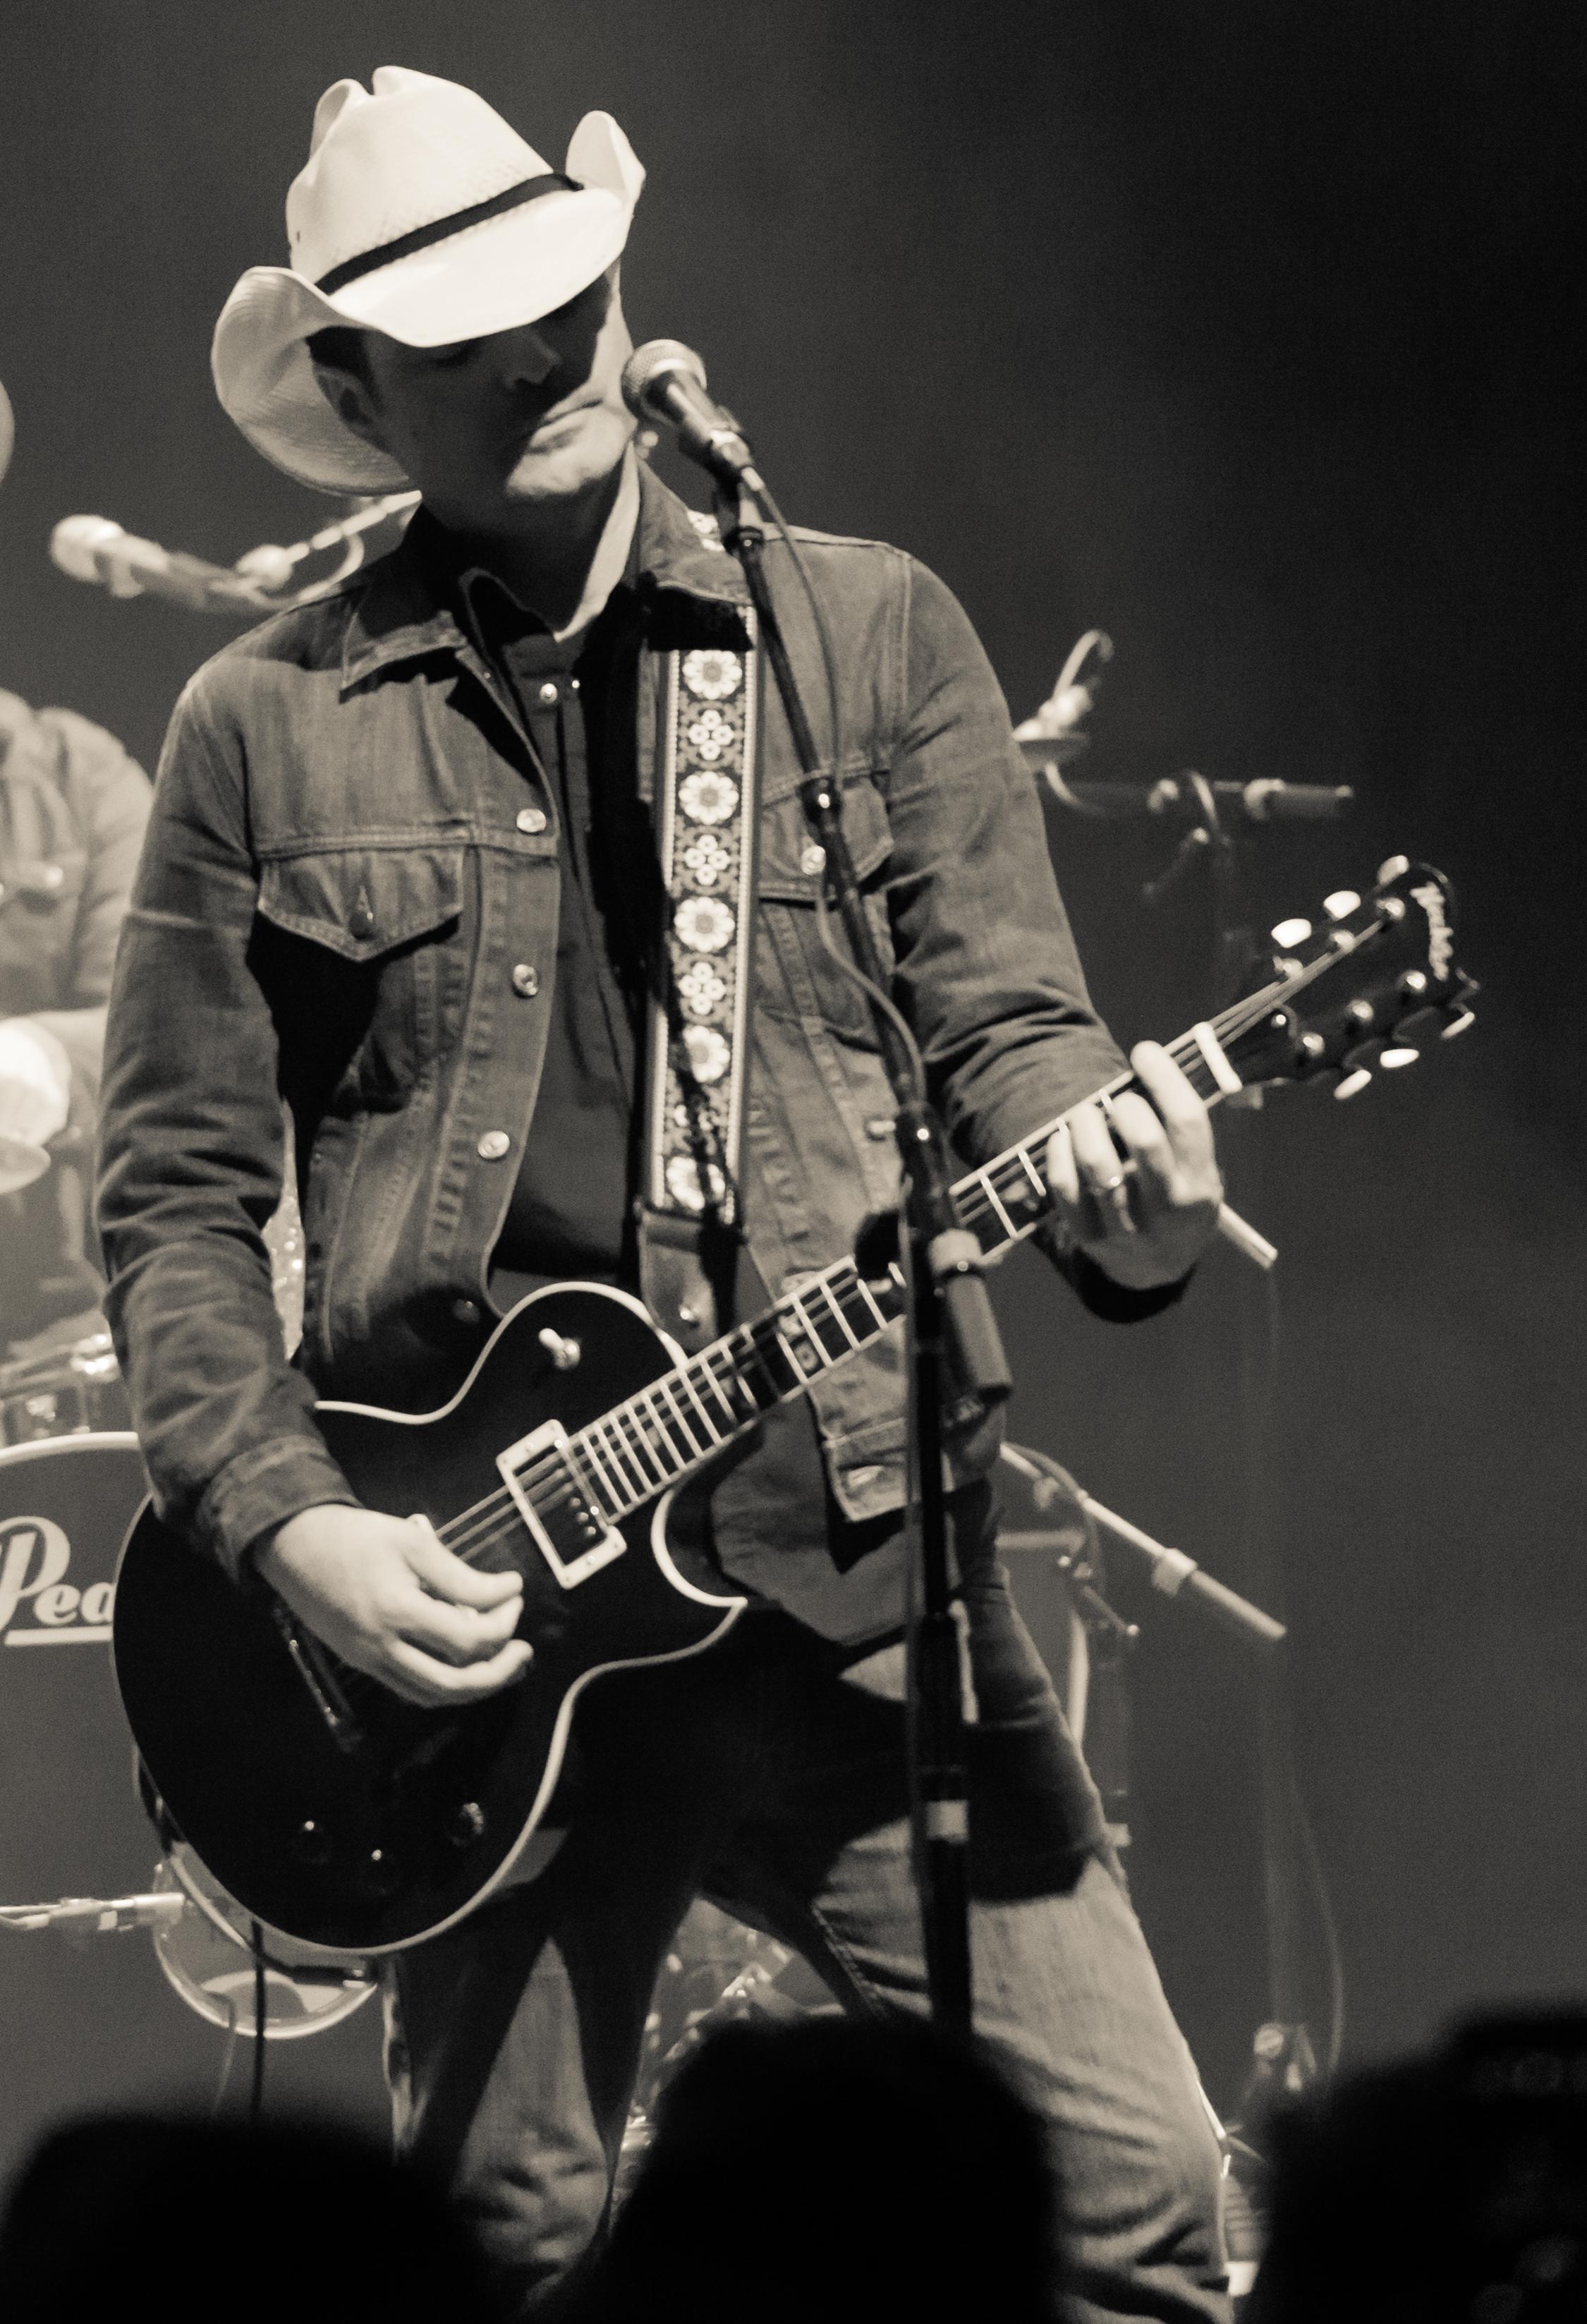 jim-dalton-guitar-bw-portrait.jpg